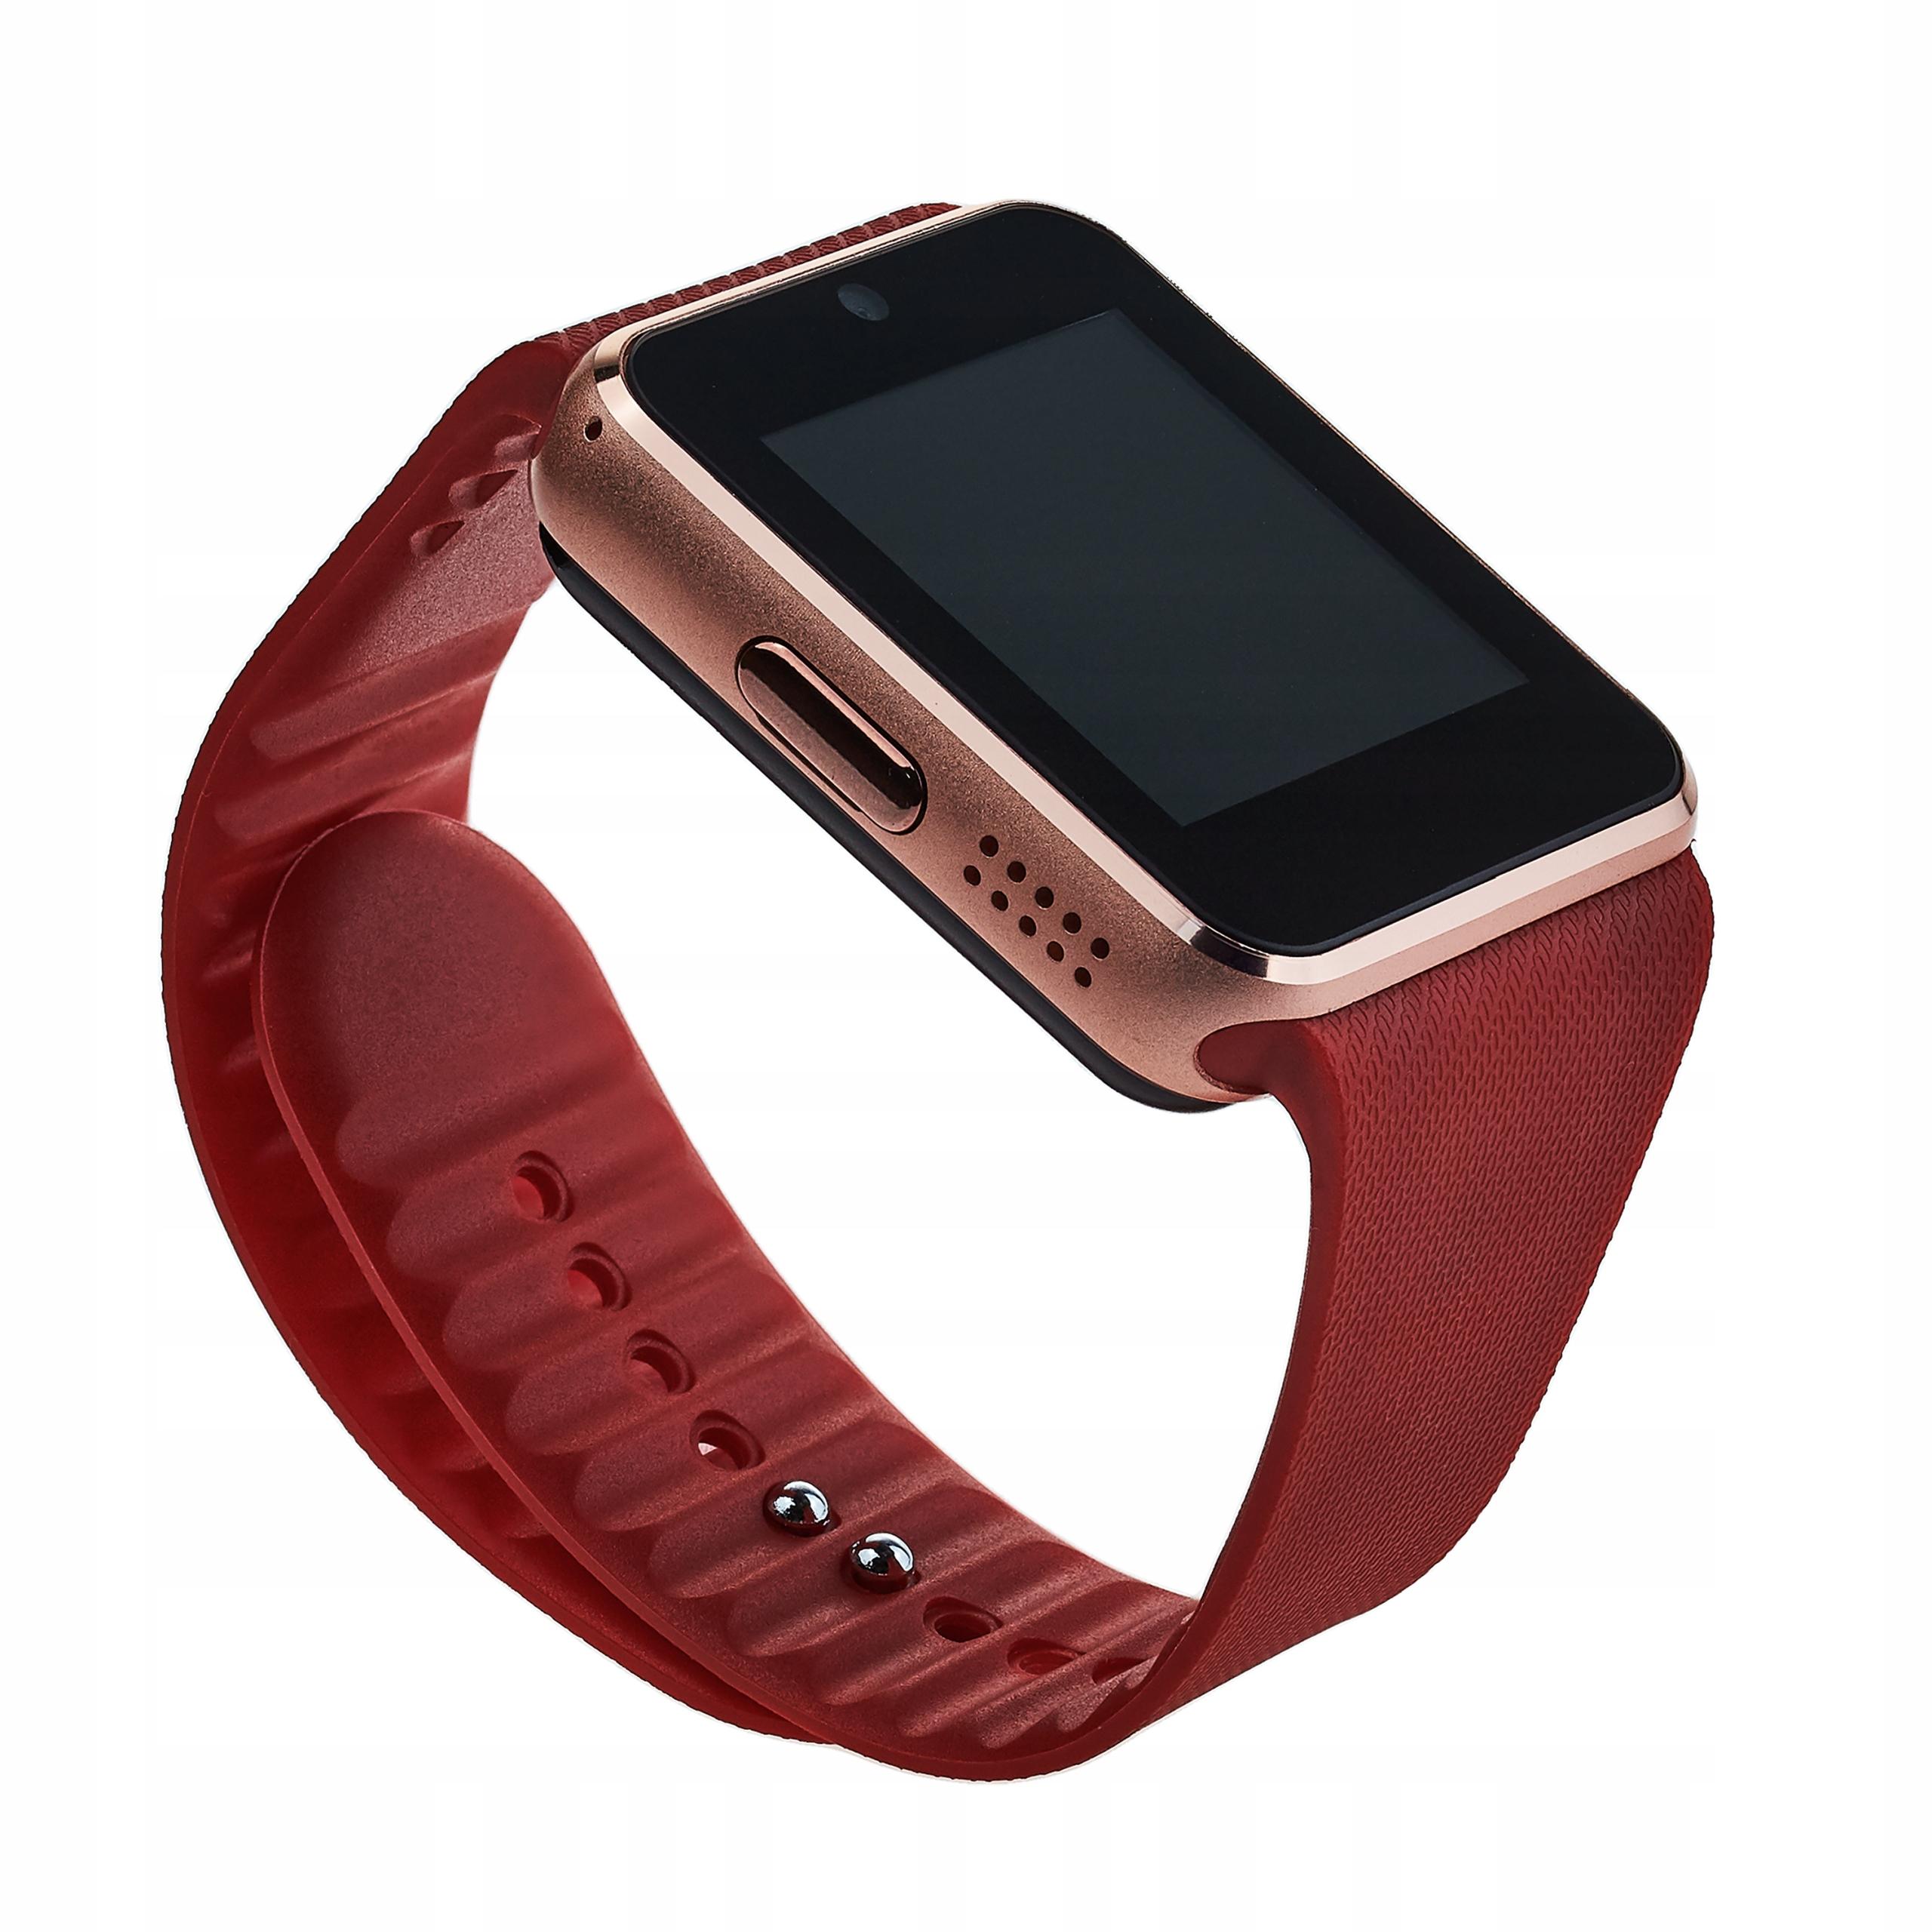 727dc480b823d9 ZEGAREK SMARTWATCH GT08 NOWY MODEL 2018 MENU PL. Smartwatch GT08 zegarek  Android do Samsung Huawei